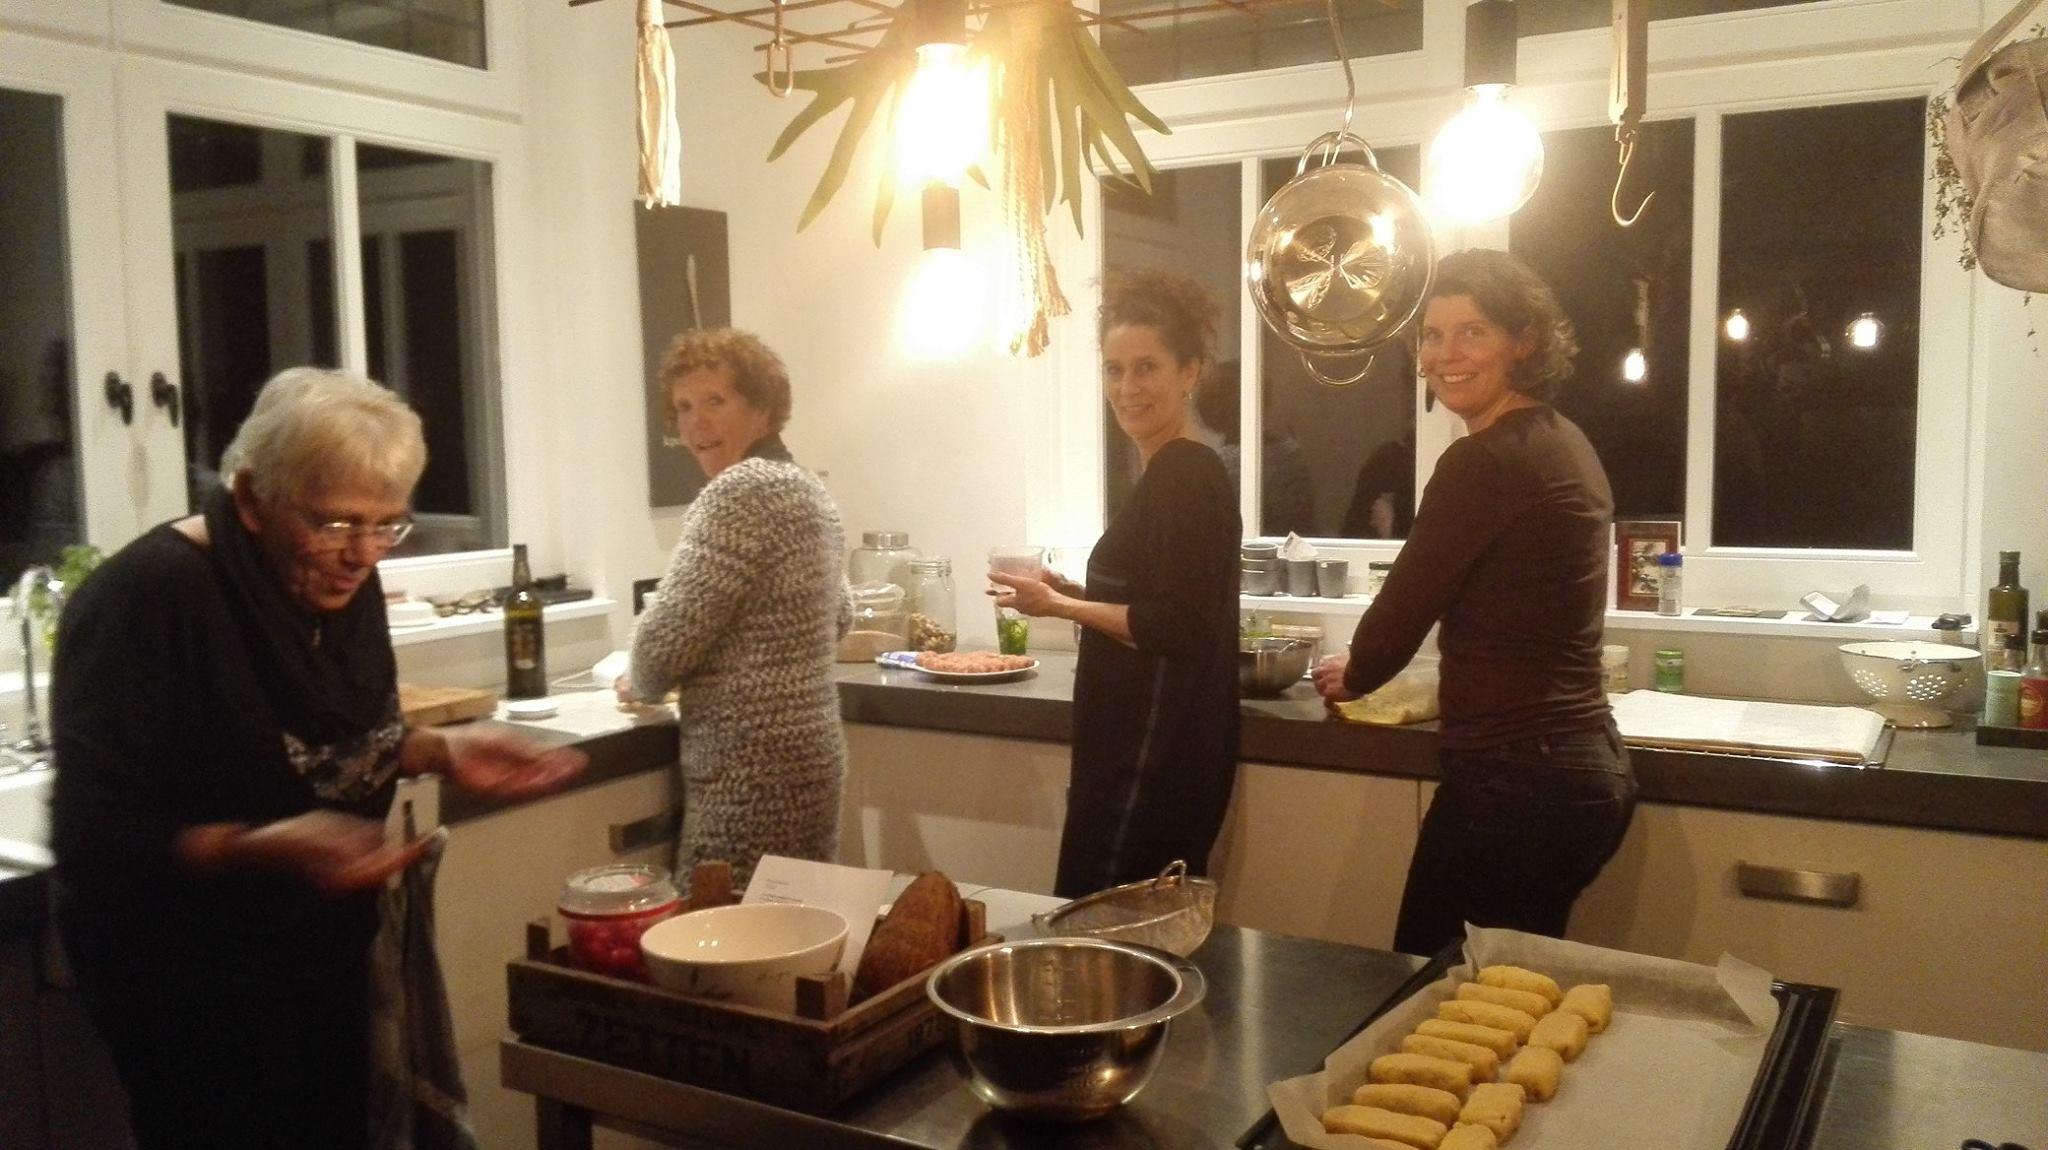 Brabantse worstenbroodjes keto-style